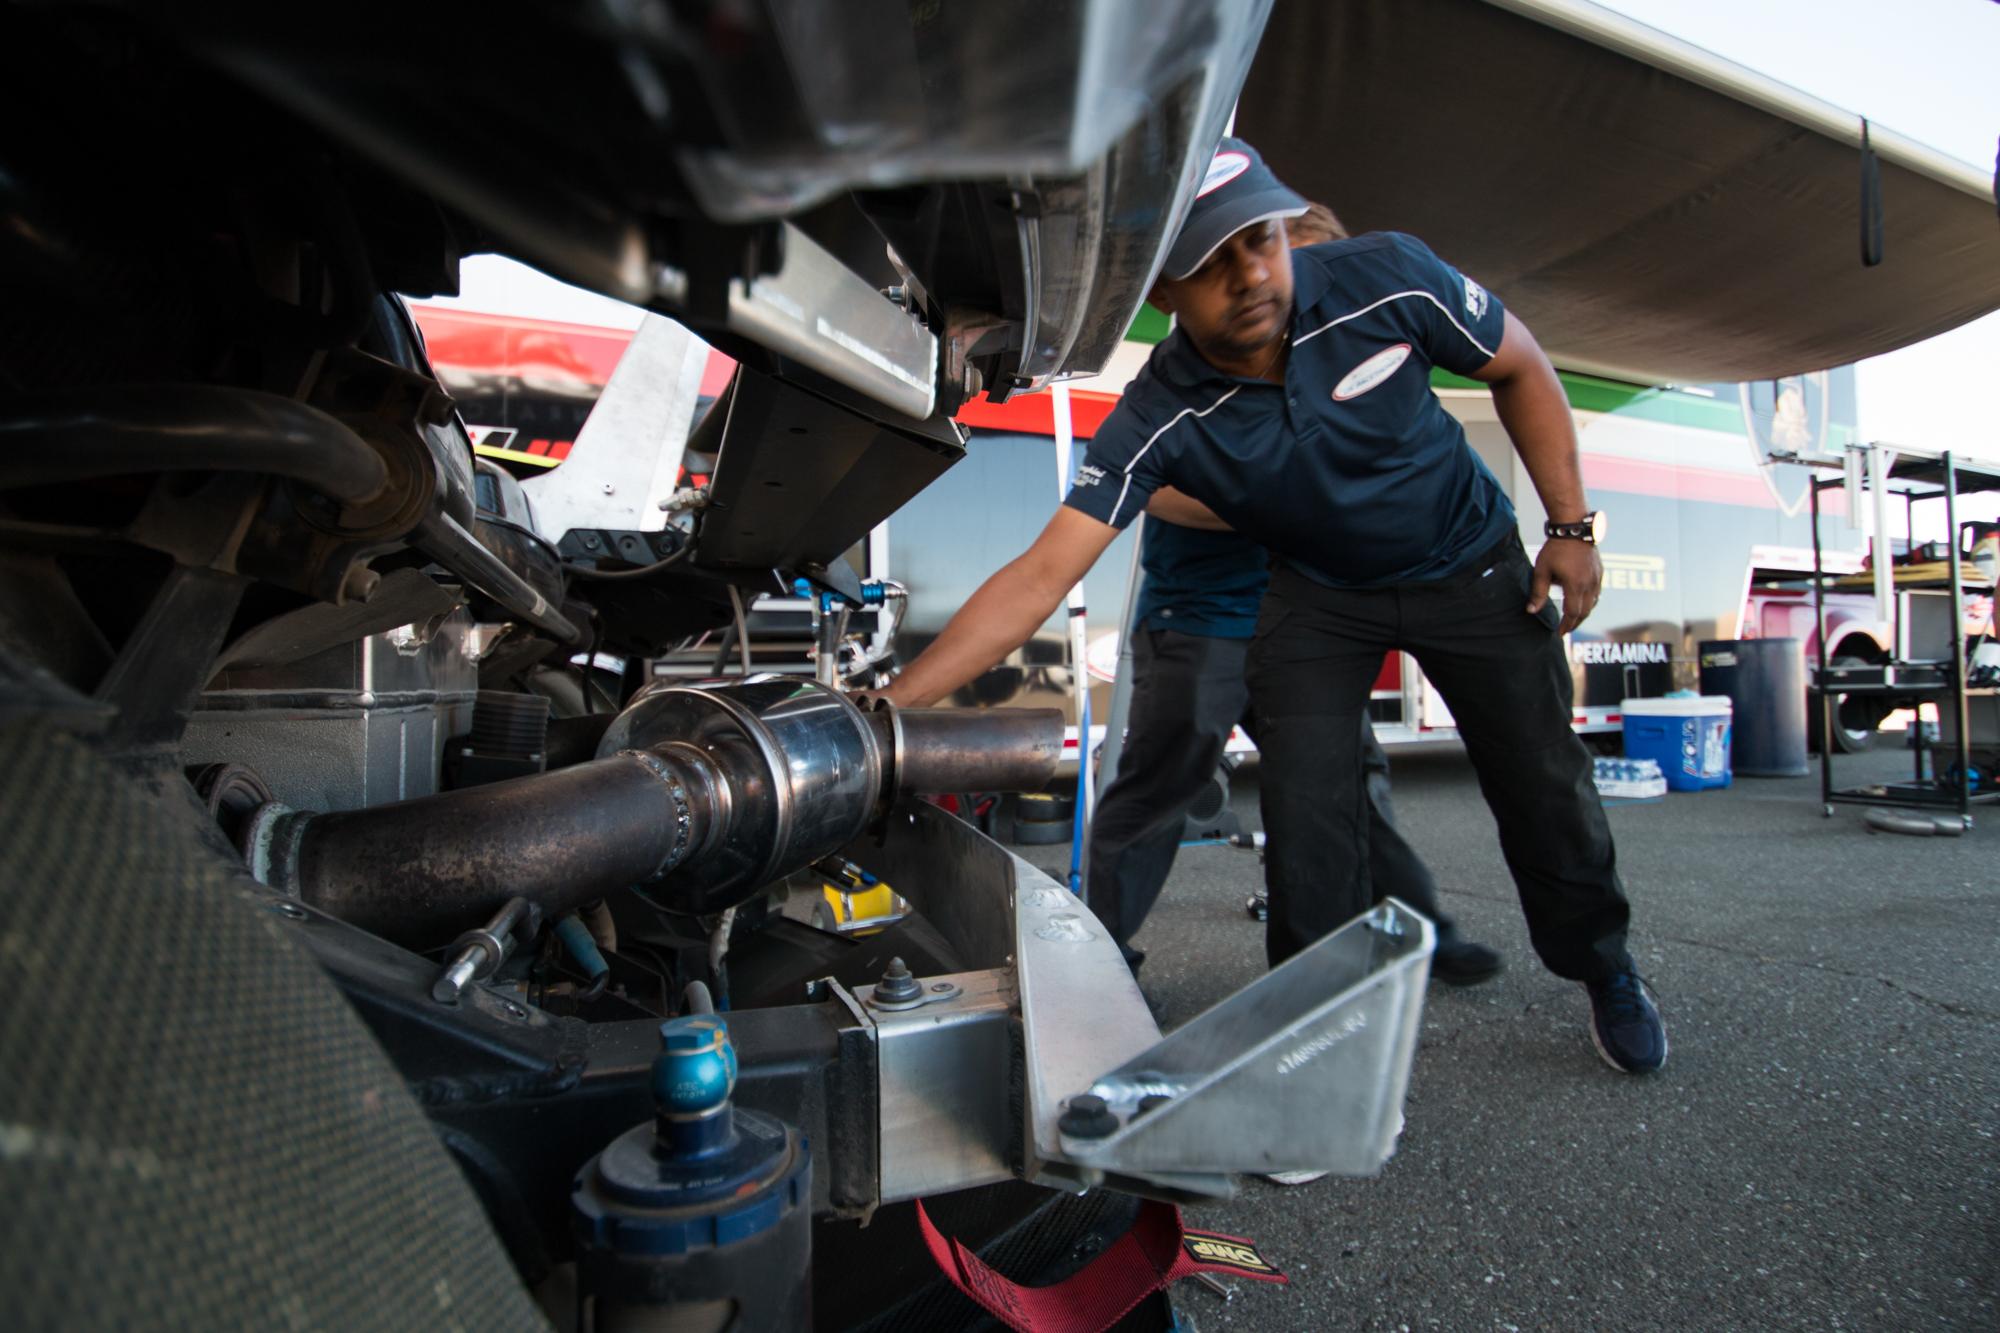 Steven-Racing-20130204-44763.jpg